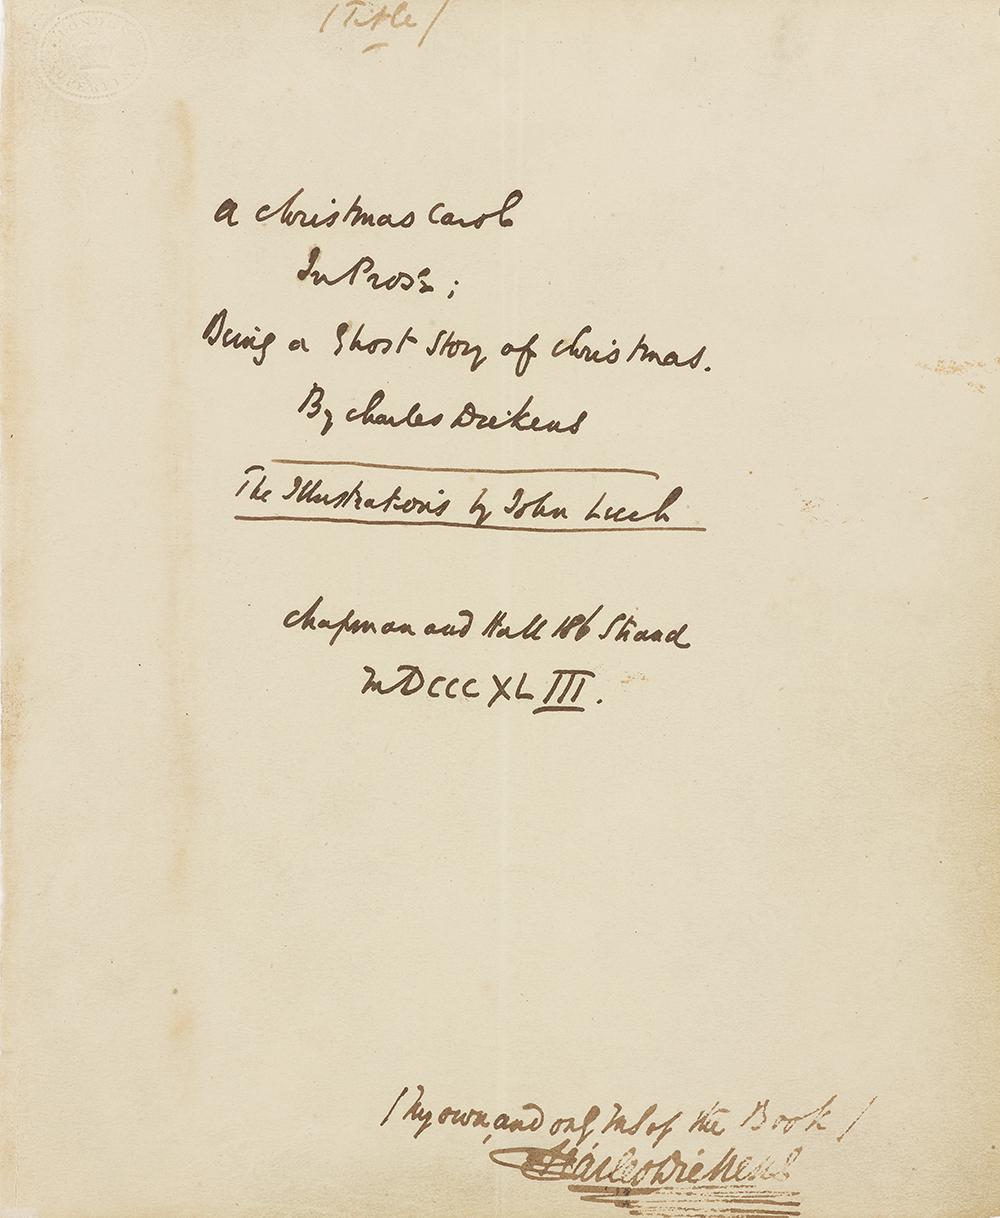 Charles Dickens A Christmas Carol Manuscript